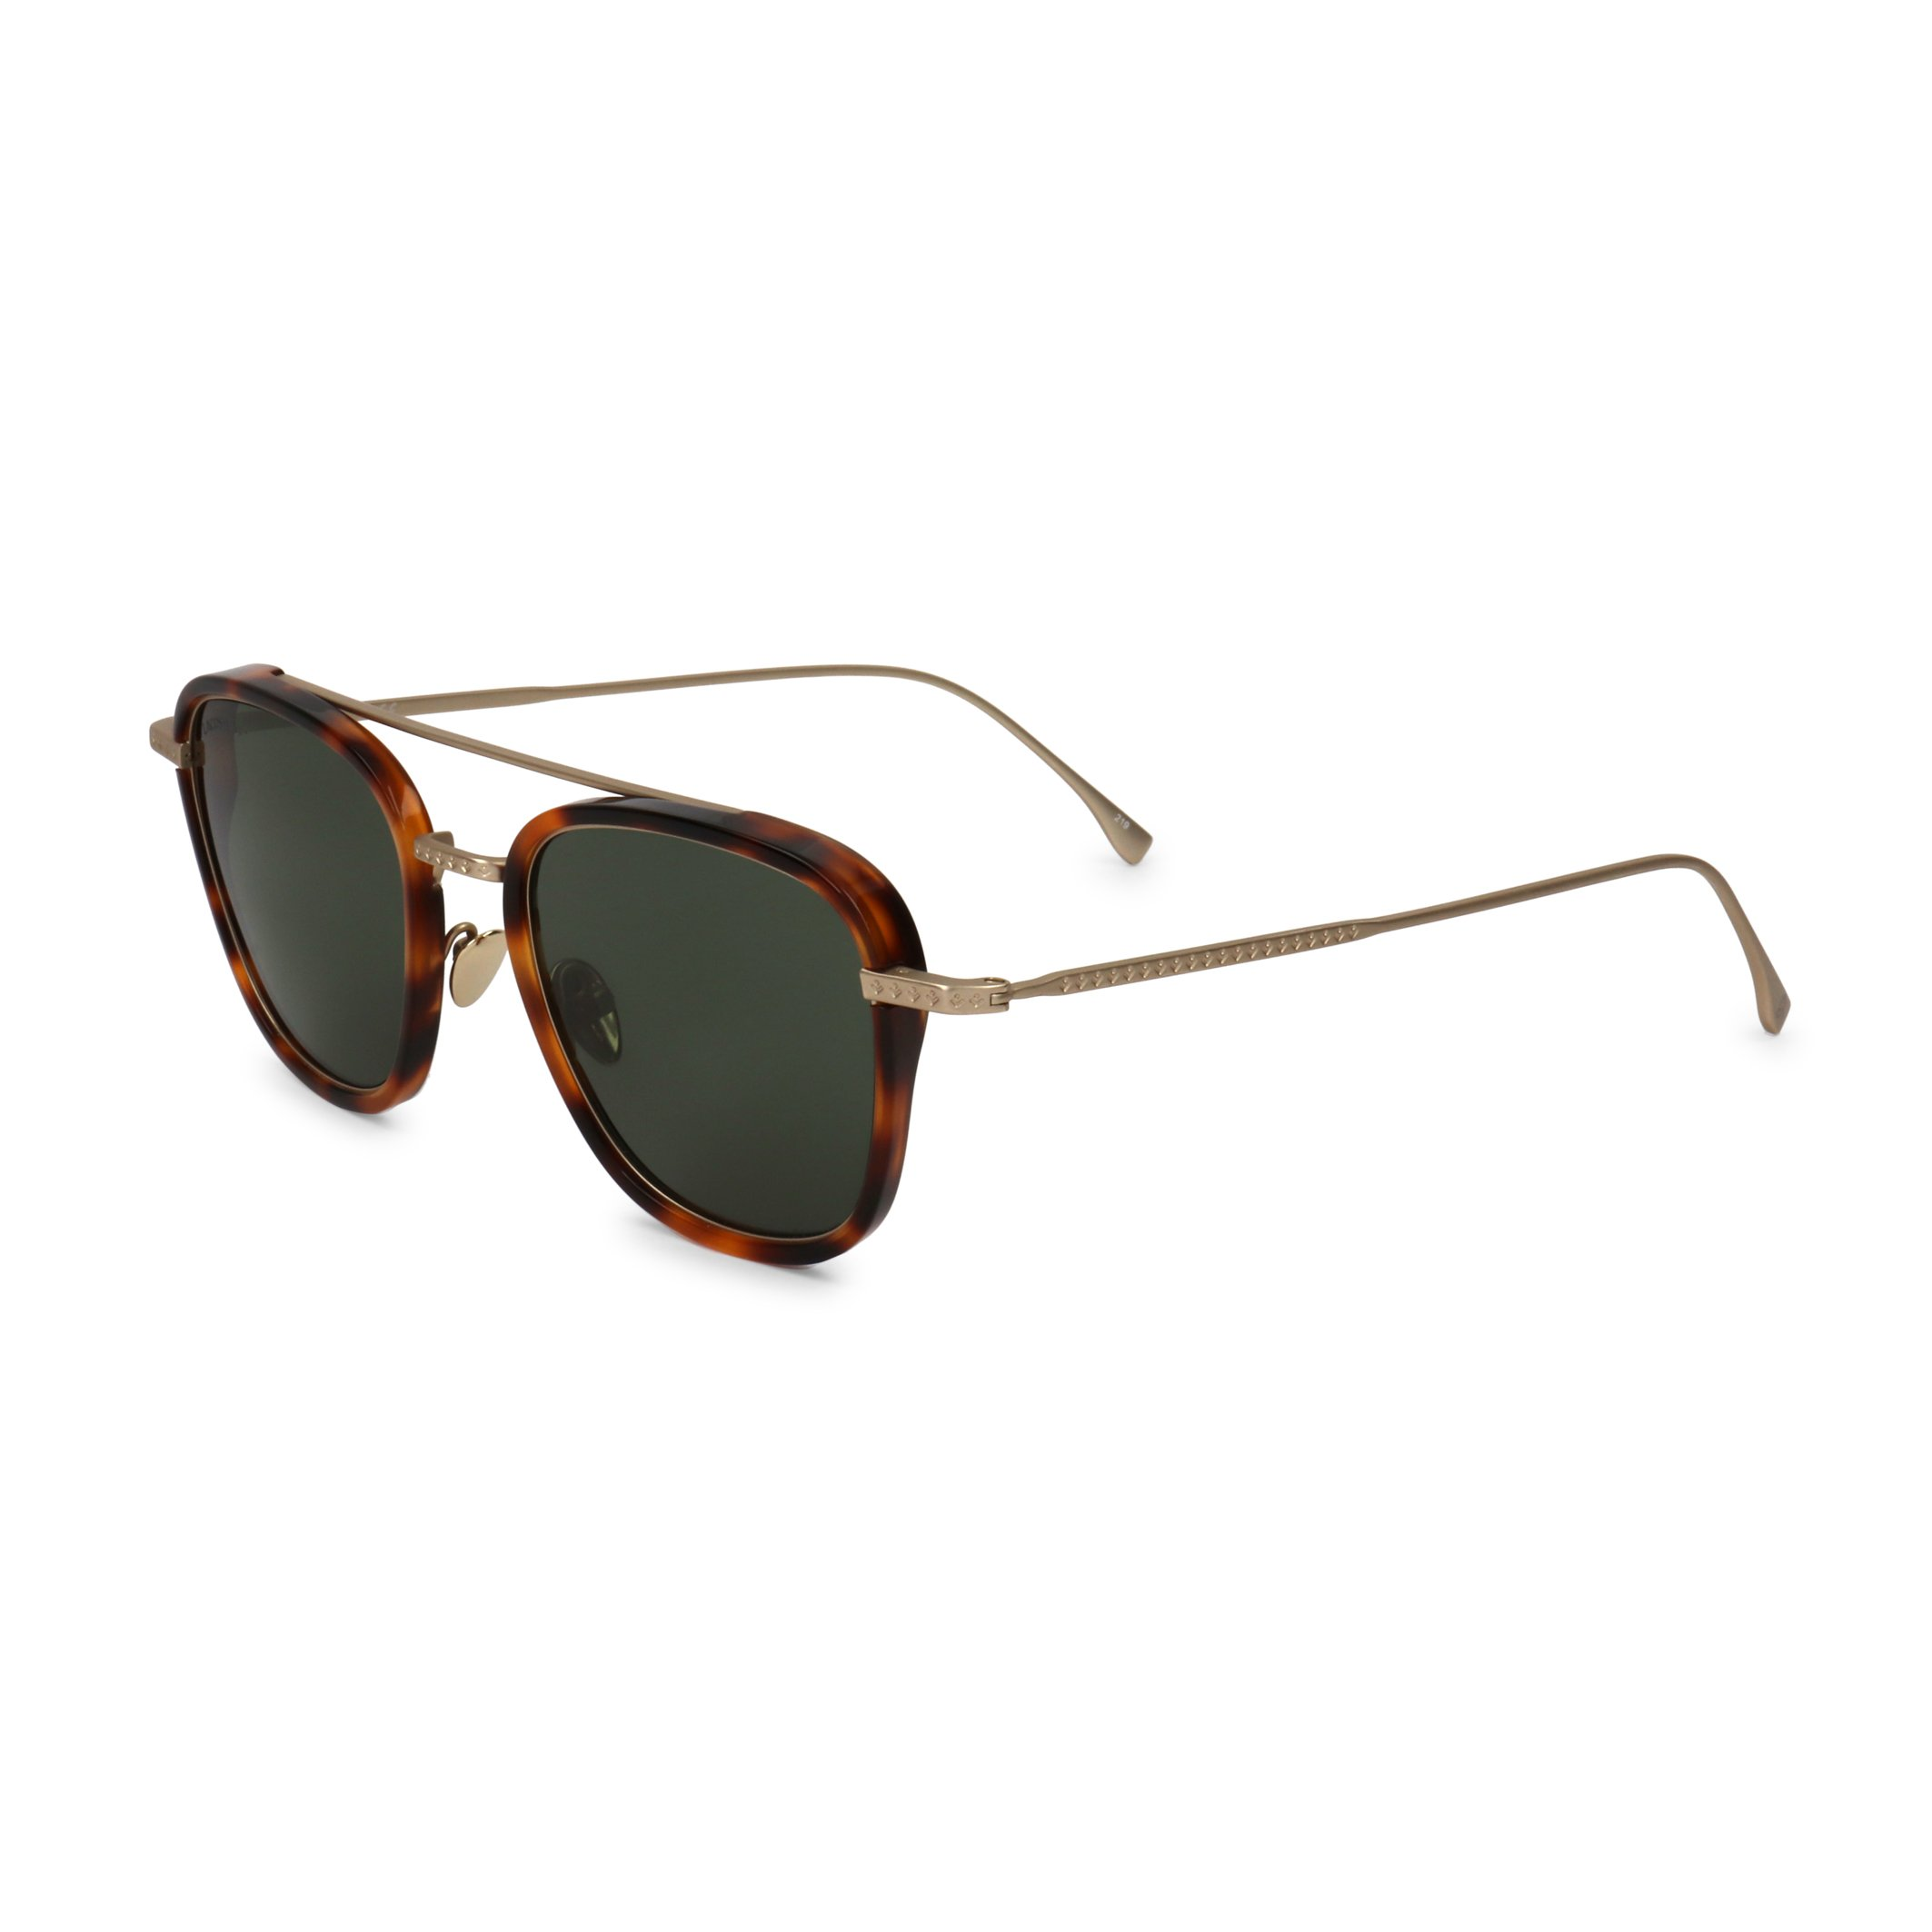 Lacoste Men's Sunglasses Brown L104SND - brown-1 NOSIZE